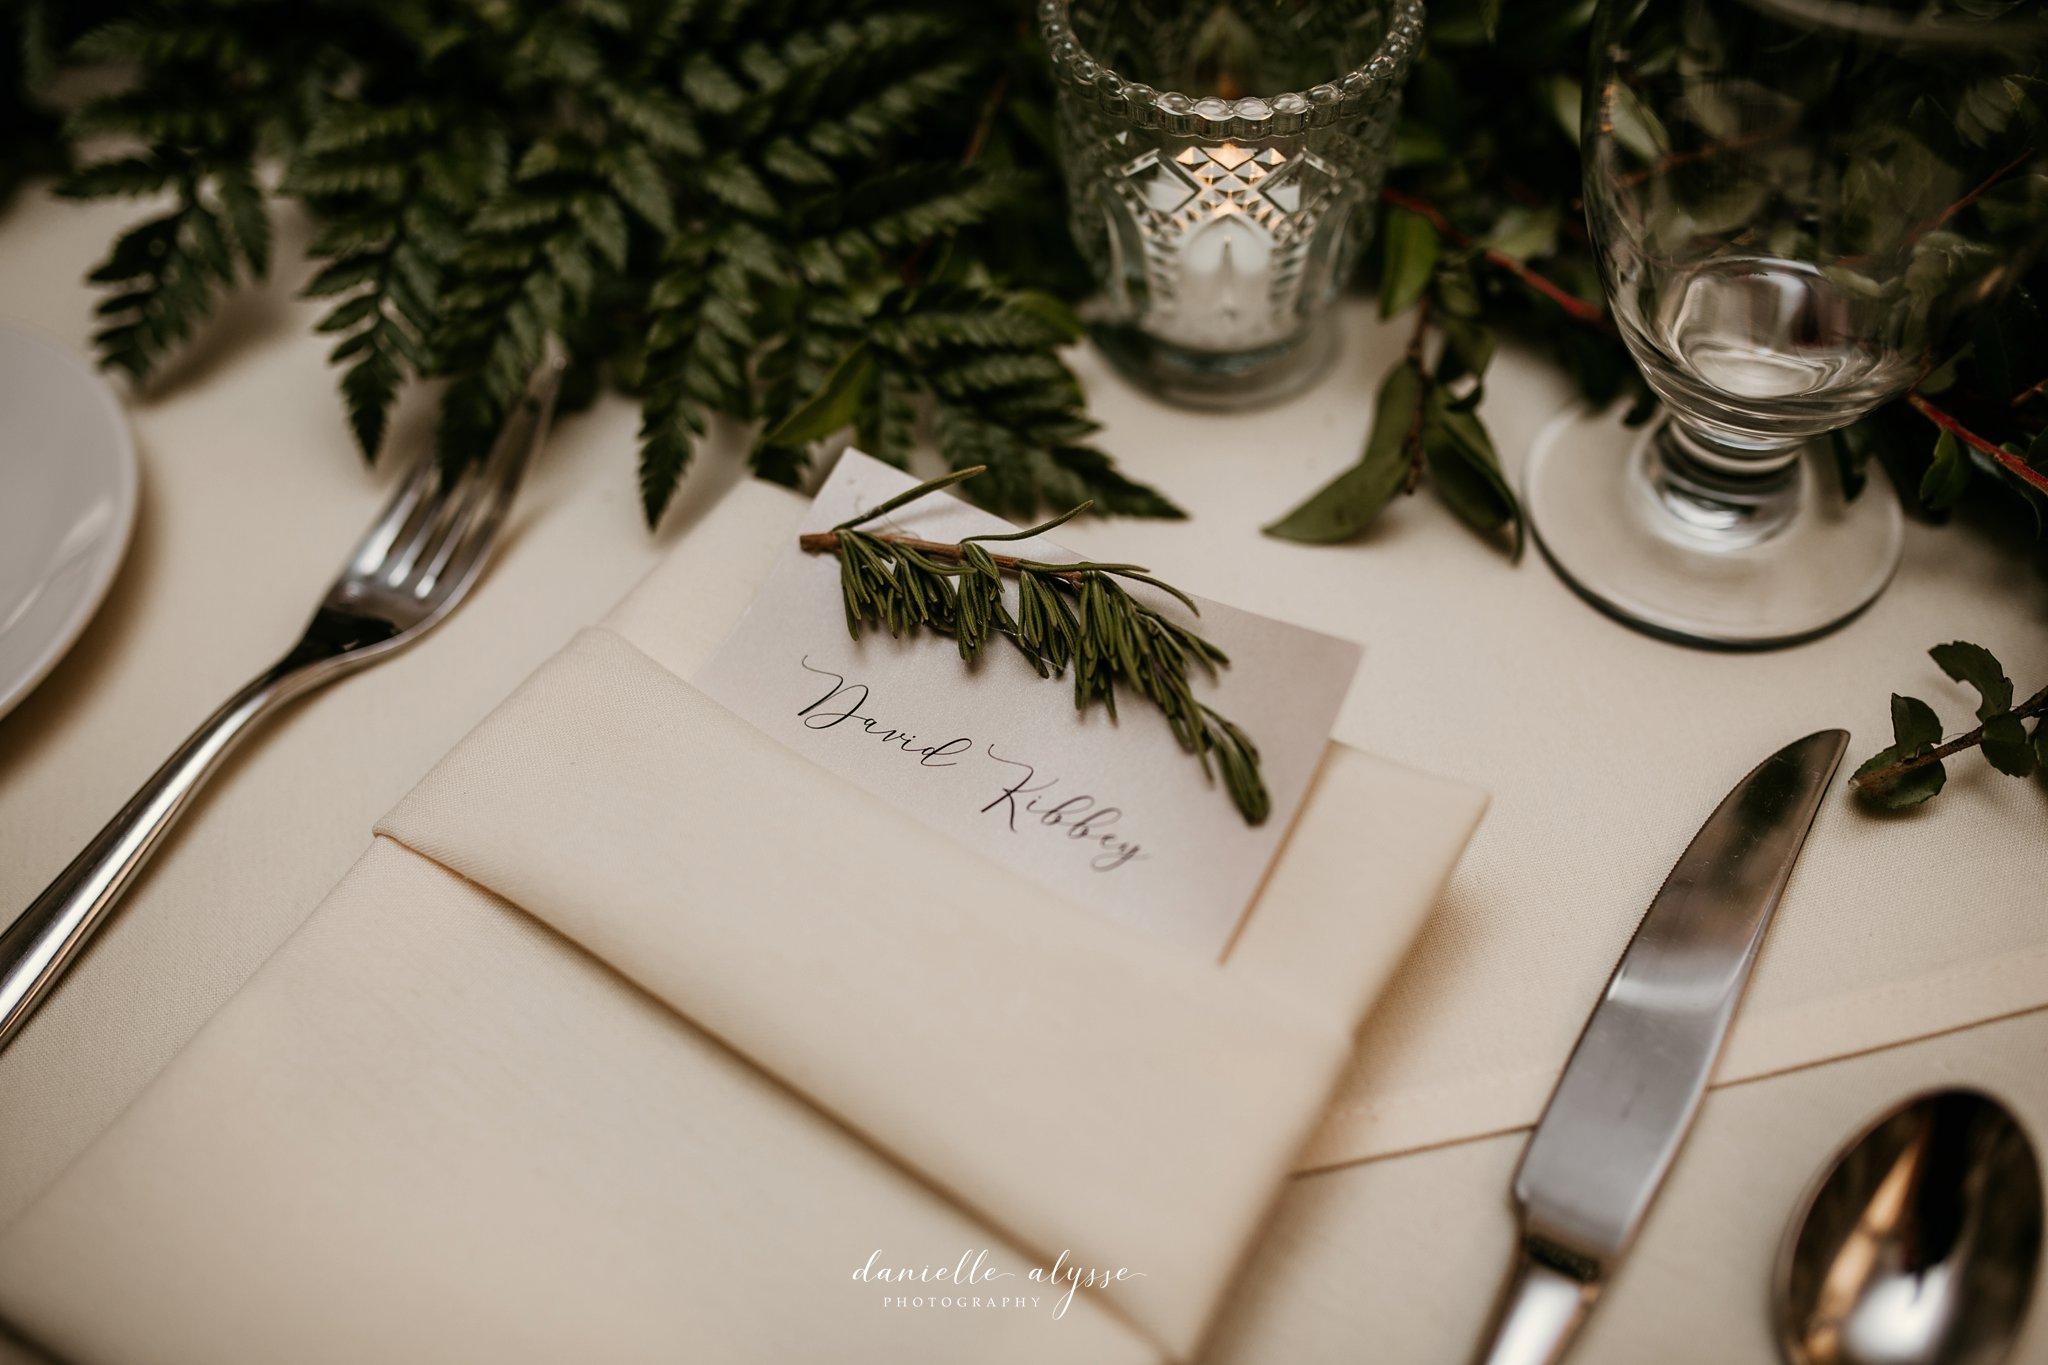 180831_wedding_stephanie_heavenly_south_lake_tahoe_danielle_alysse_photography_destination_blog_513_WEB.jpg